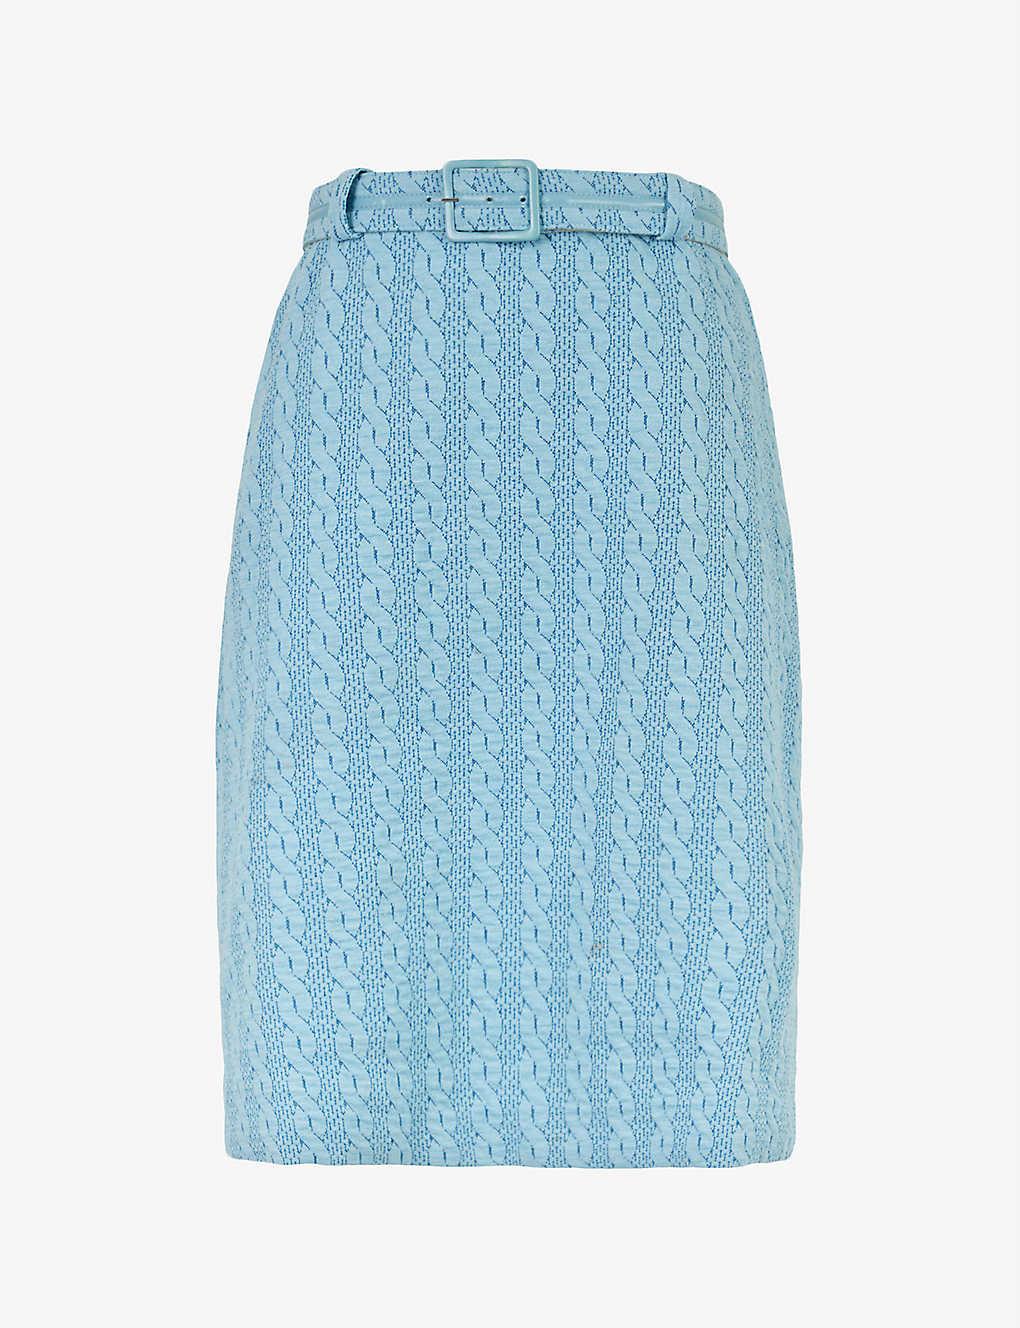 Pre-loved high-waisted woven midi skirt